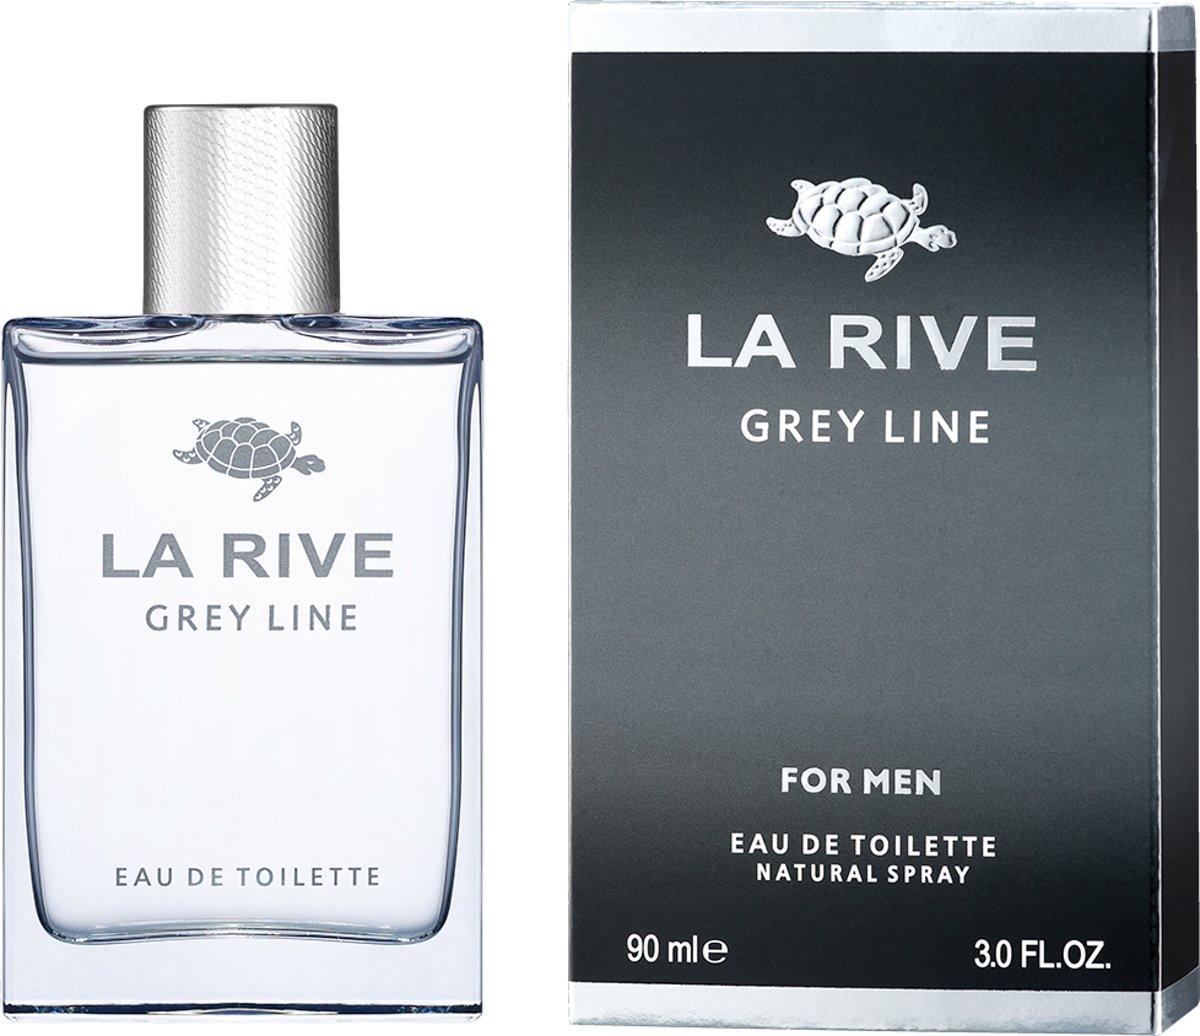 La Rive Grey Line - 90 ml - Eau de Toilette kopen